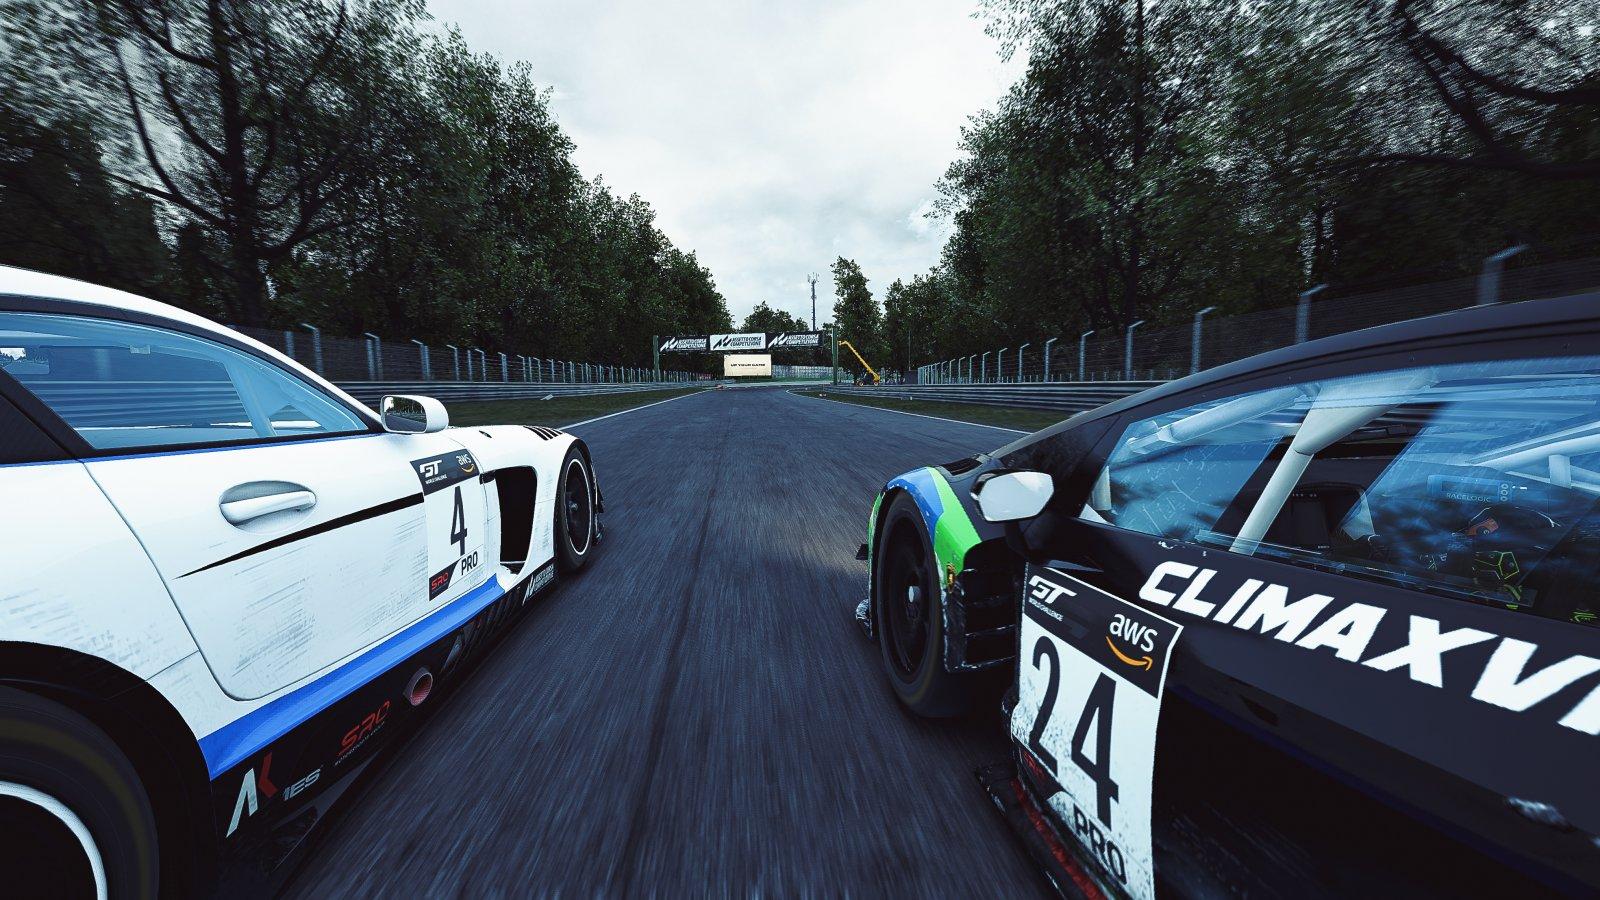 Esports R1 - Monza - Aaron Borg Mercedes-AMG GT3 SRT Team Sydney 4 AUS PRO & Kang Ling Lamborghini Huracan Evo Climax Racing Team 24 CHN PRO